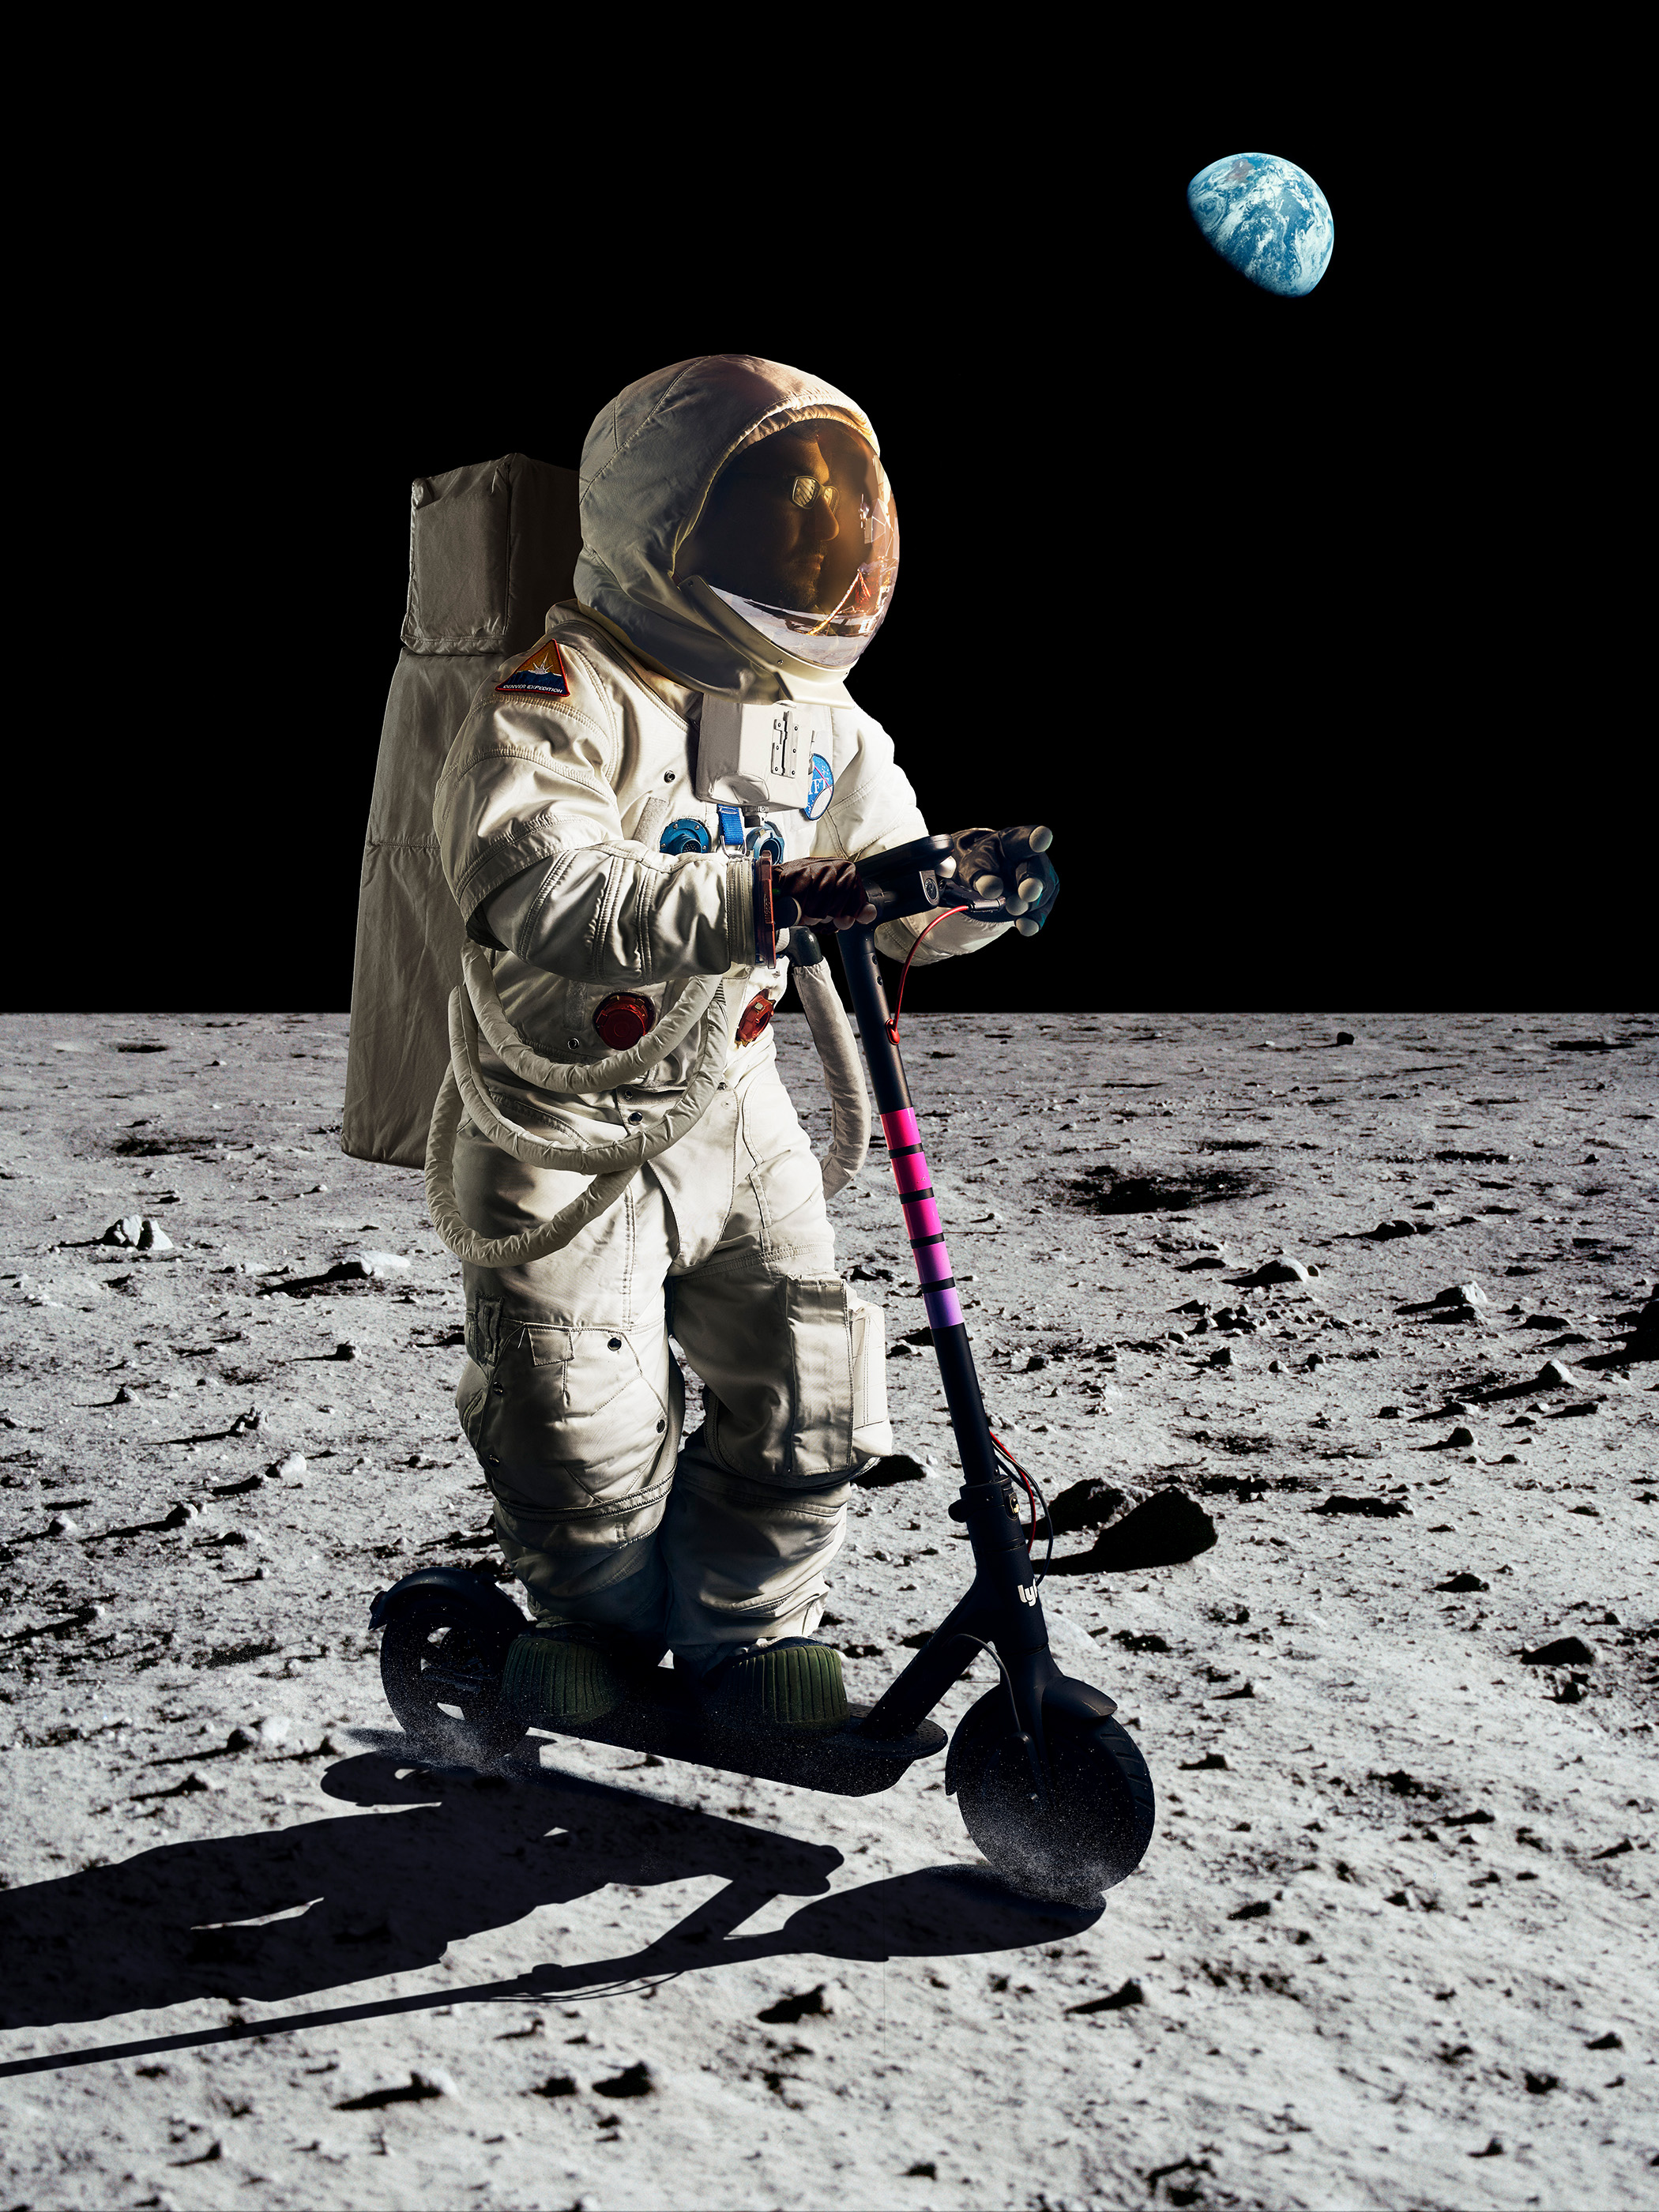 Lyft_Space_1067_lr.jpg